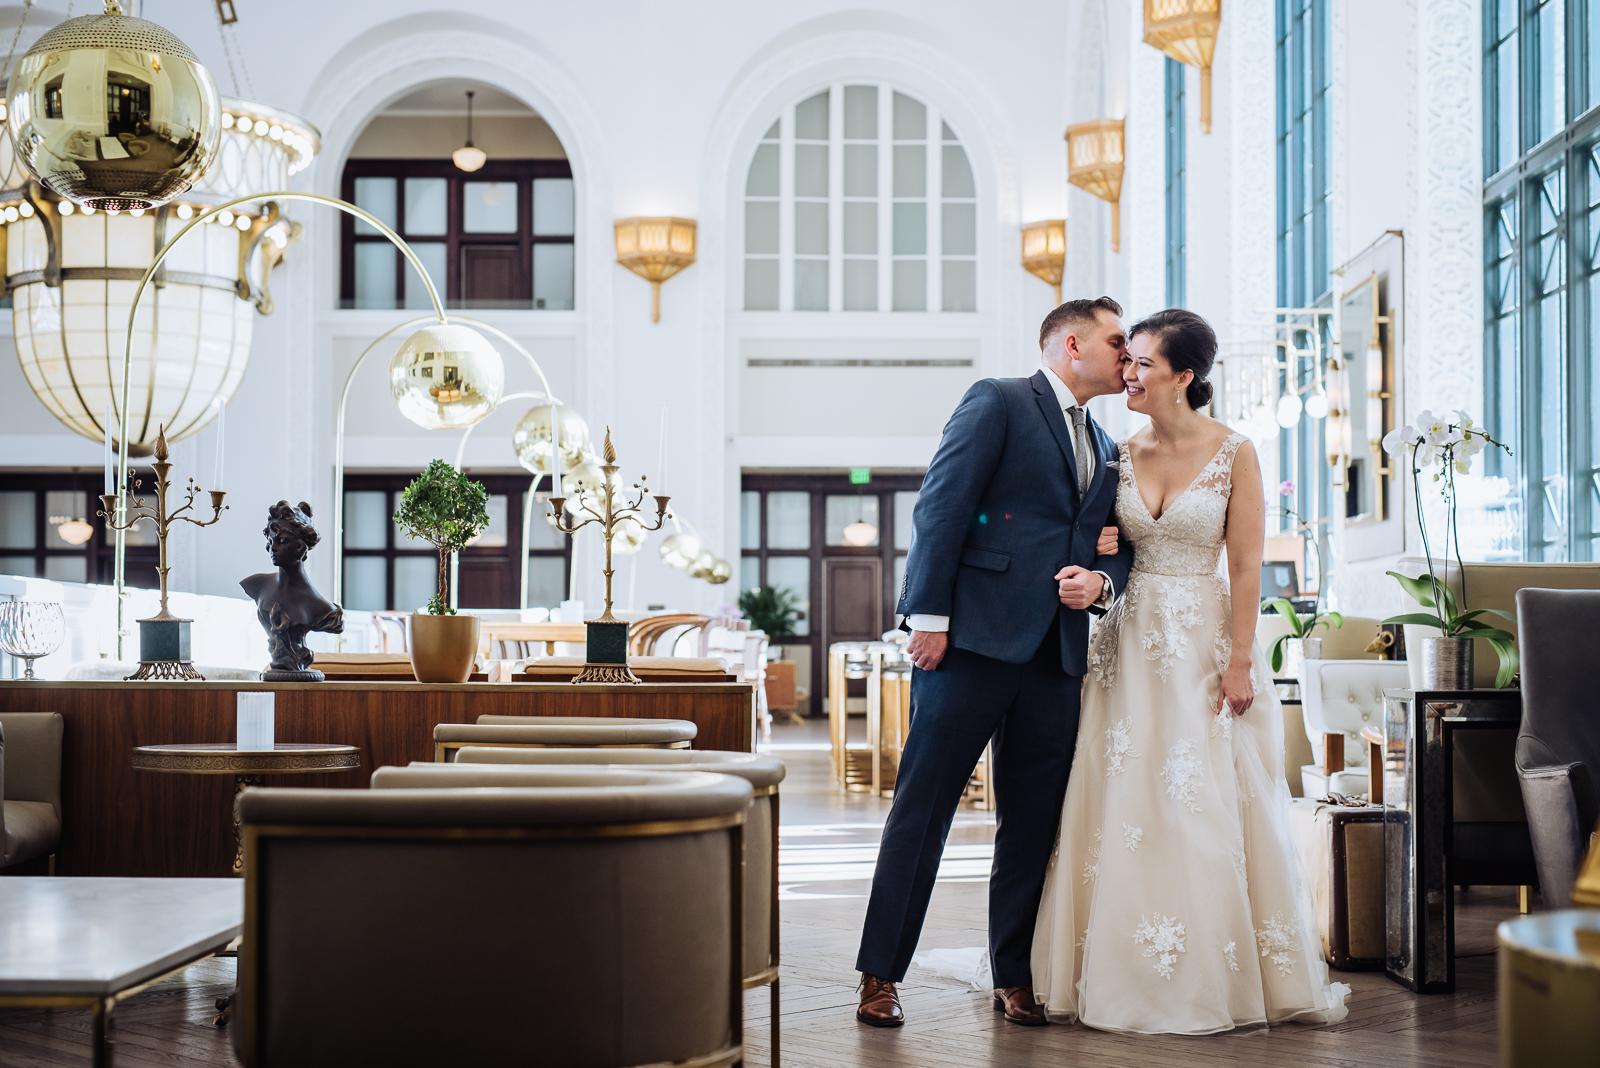 Deborah & Kevin | Wedding Photo | Oxford Hotel & Arrowhead | From the Hip Photo